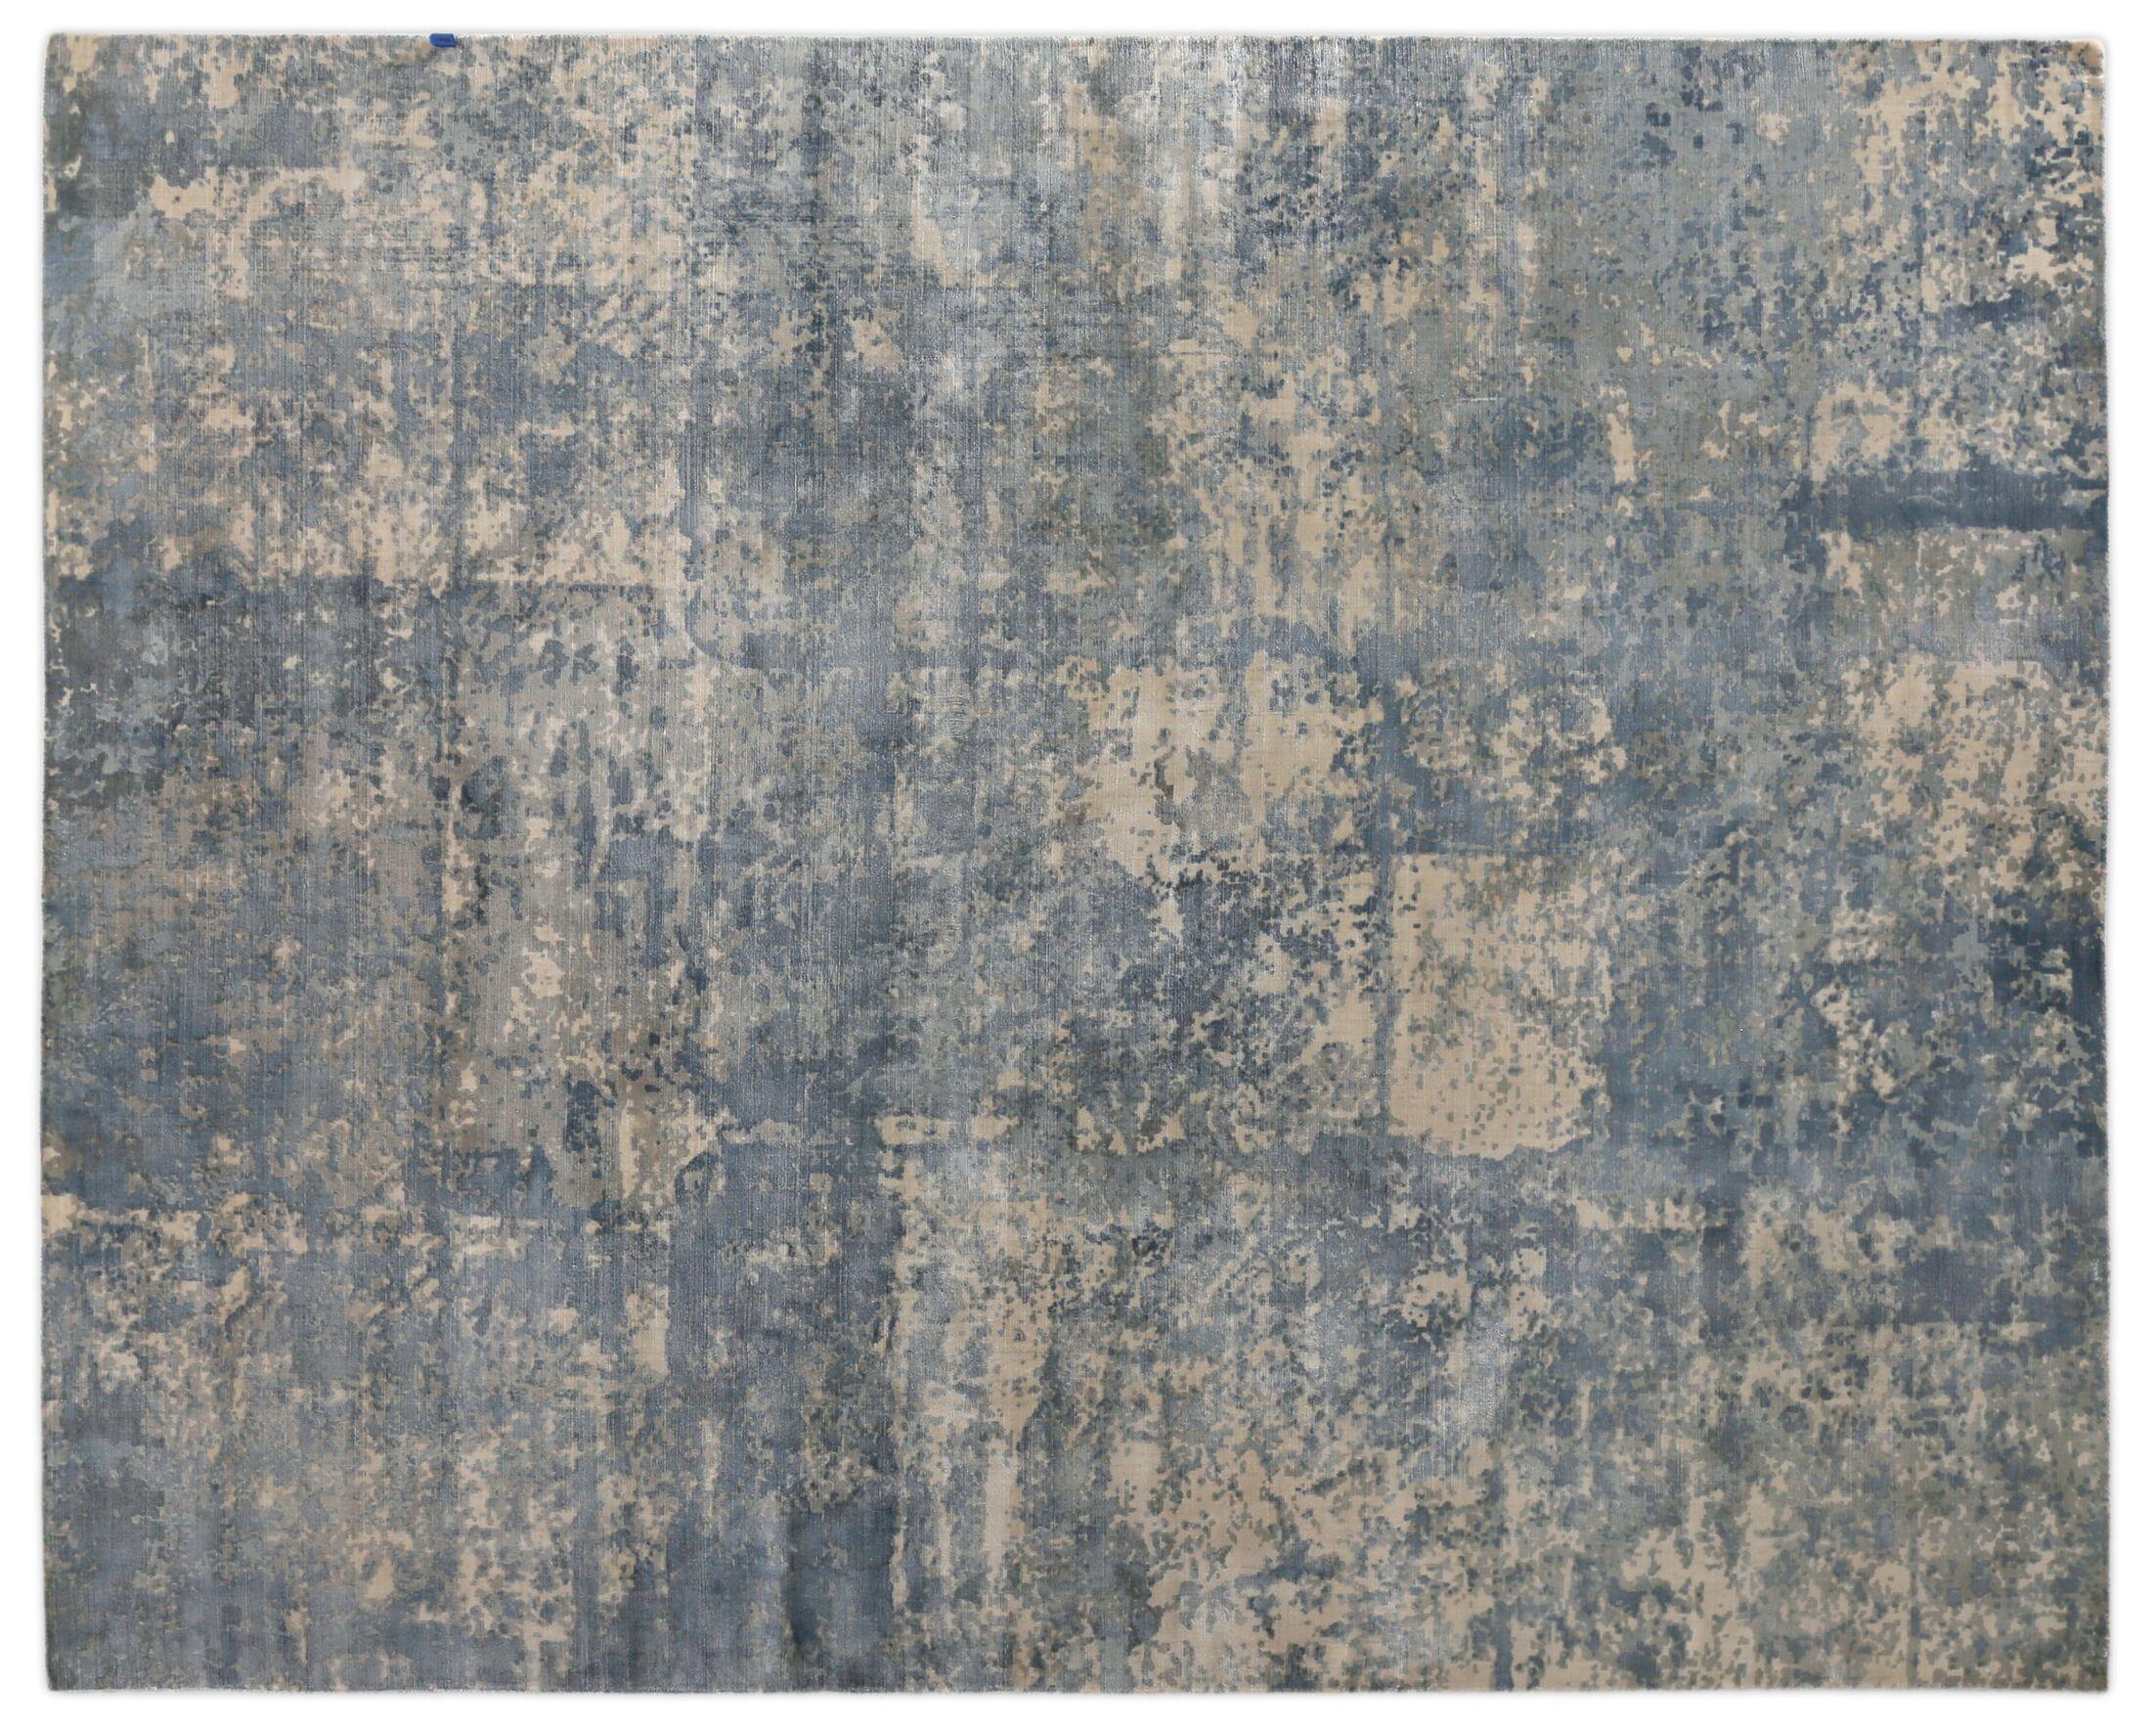 Koda Hand-Woven Silk River Rock Area Rug Rug Size: Rectangle 9' x 12'